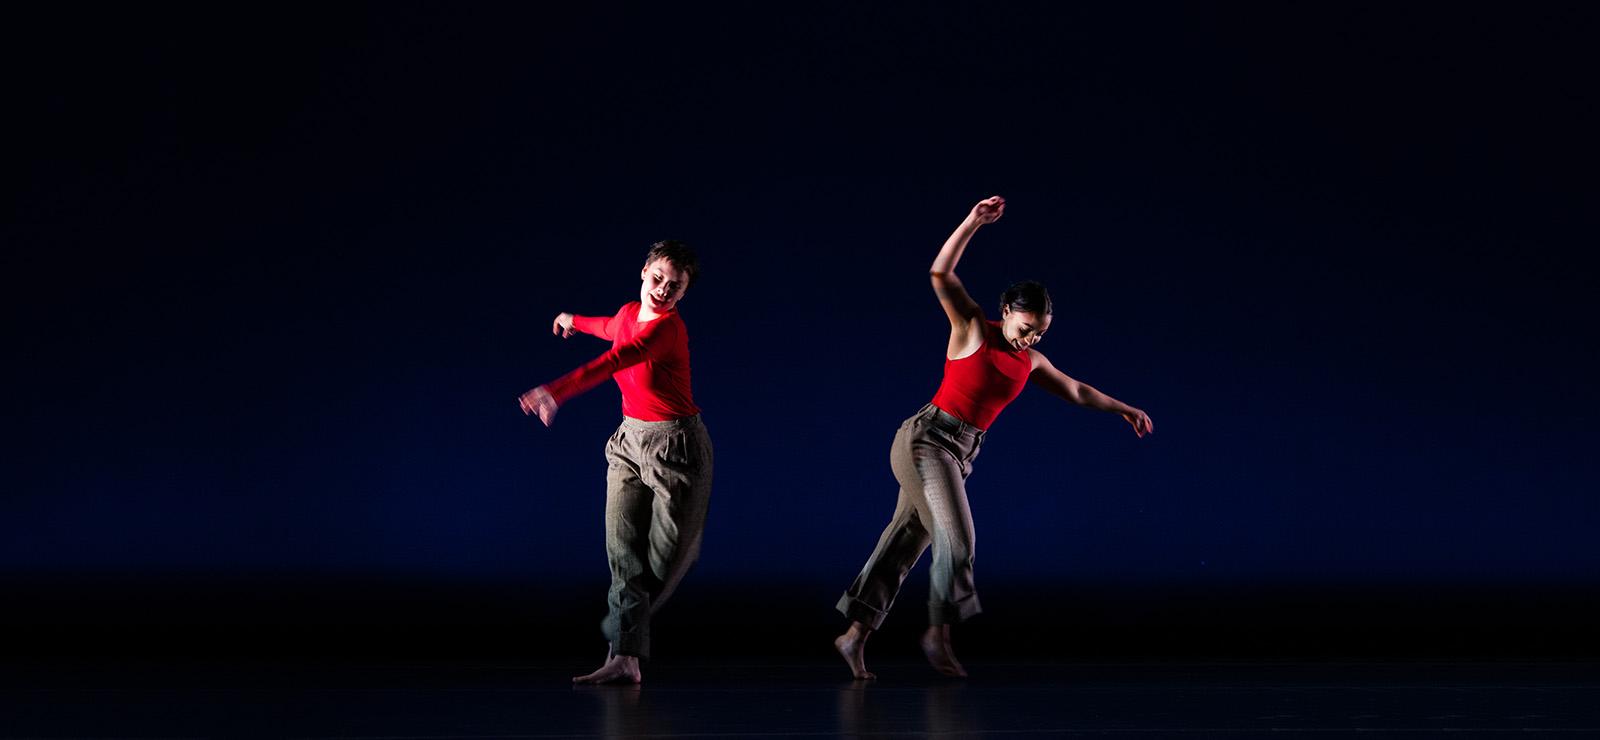 [Fall Dance]